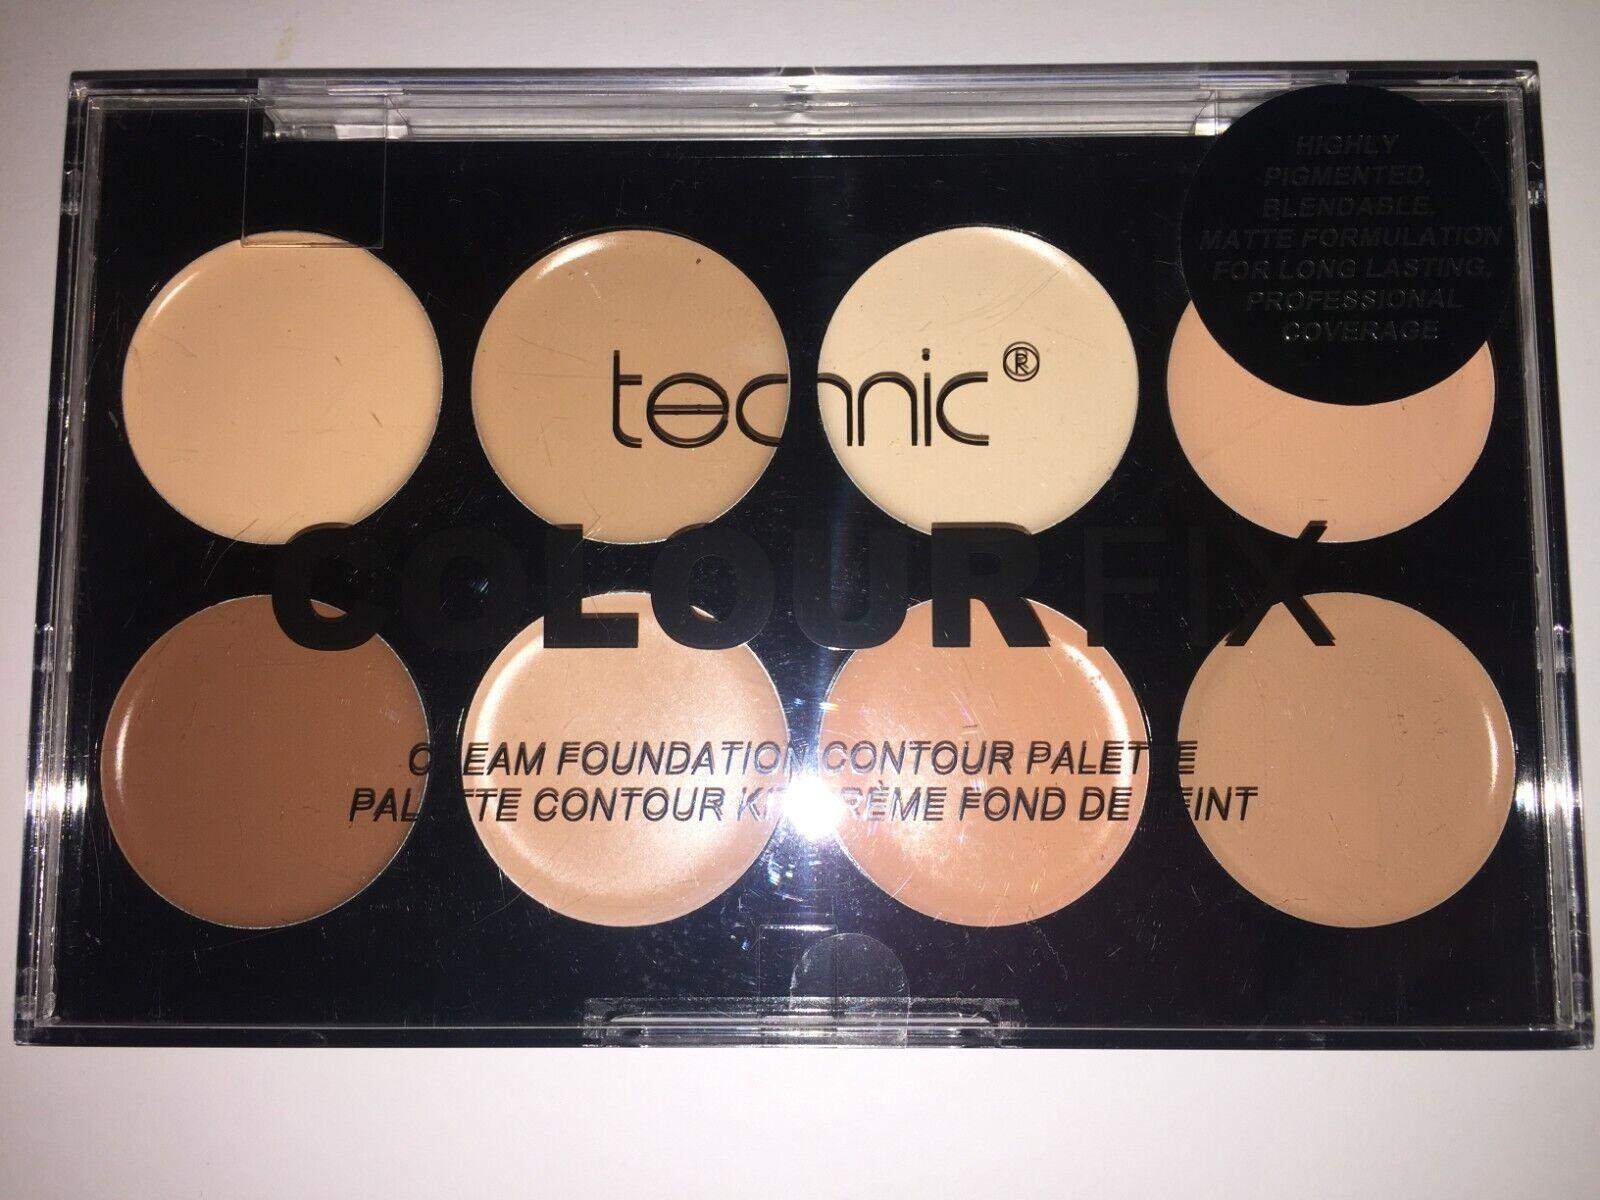 Creme Kontouring Palette Make-Up Rouge Bronzer peach nude Puder Contour Kompakt